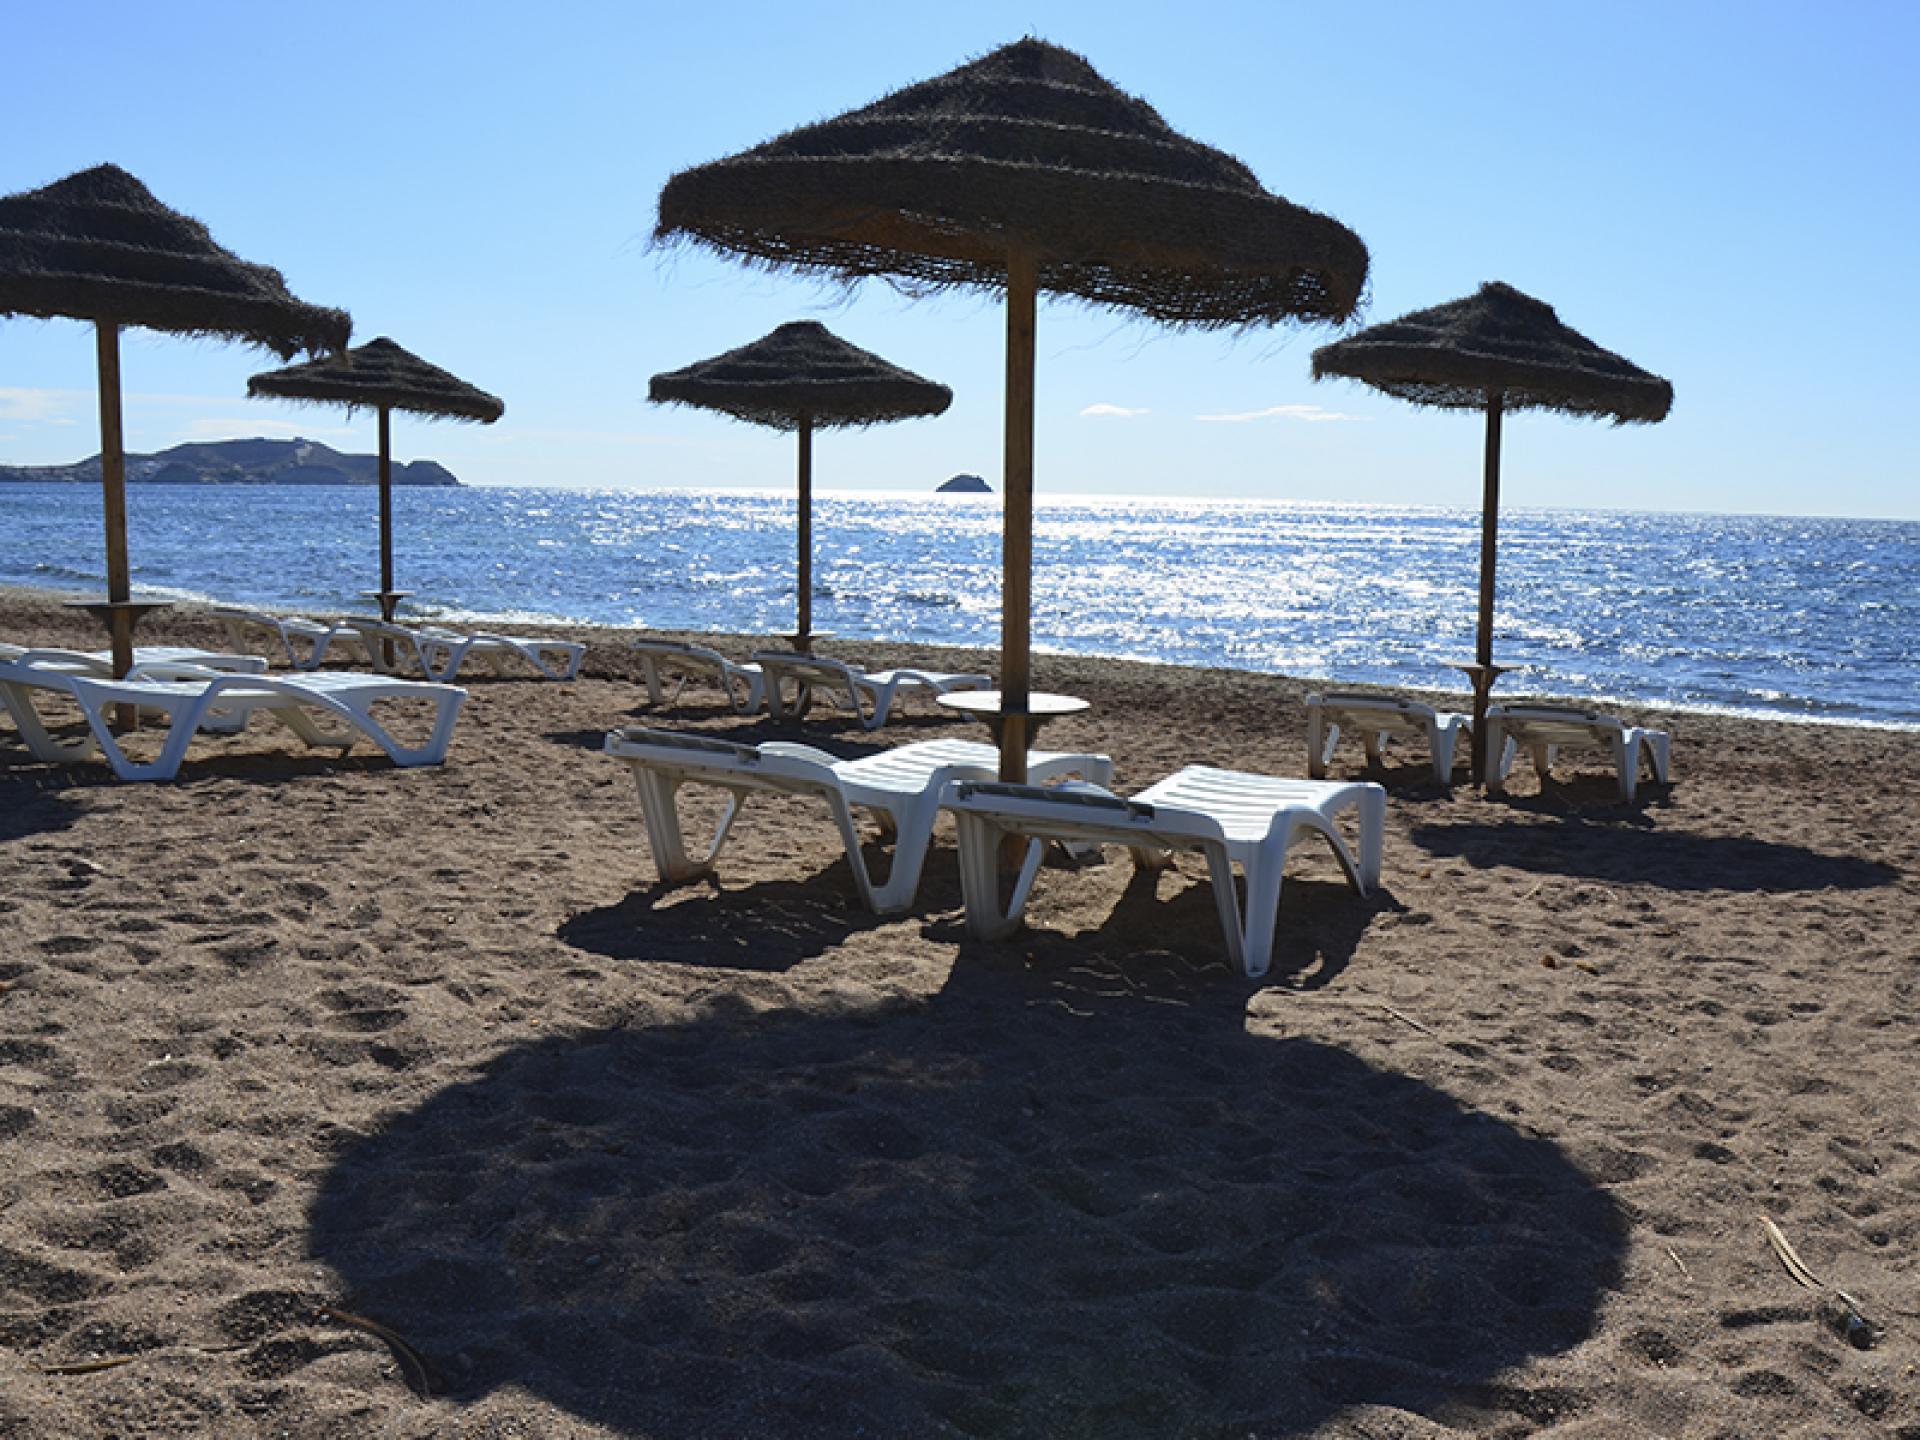 Mar de Pulpi fase 7 - Costa de Almeria / Pulpi (Almeria)